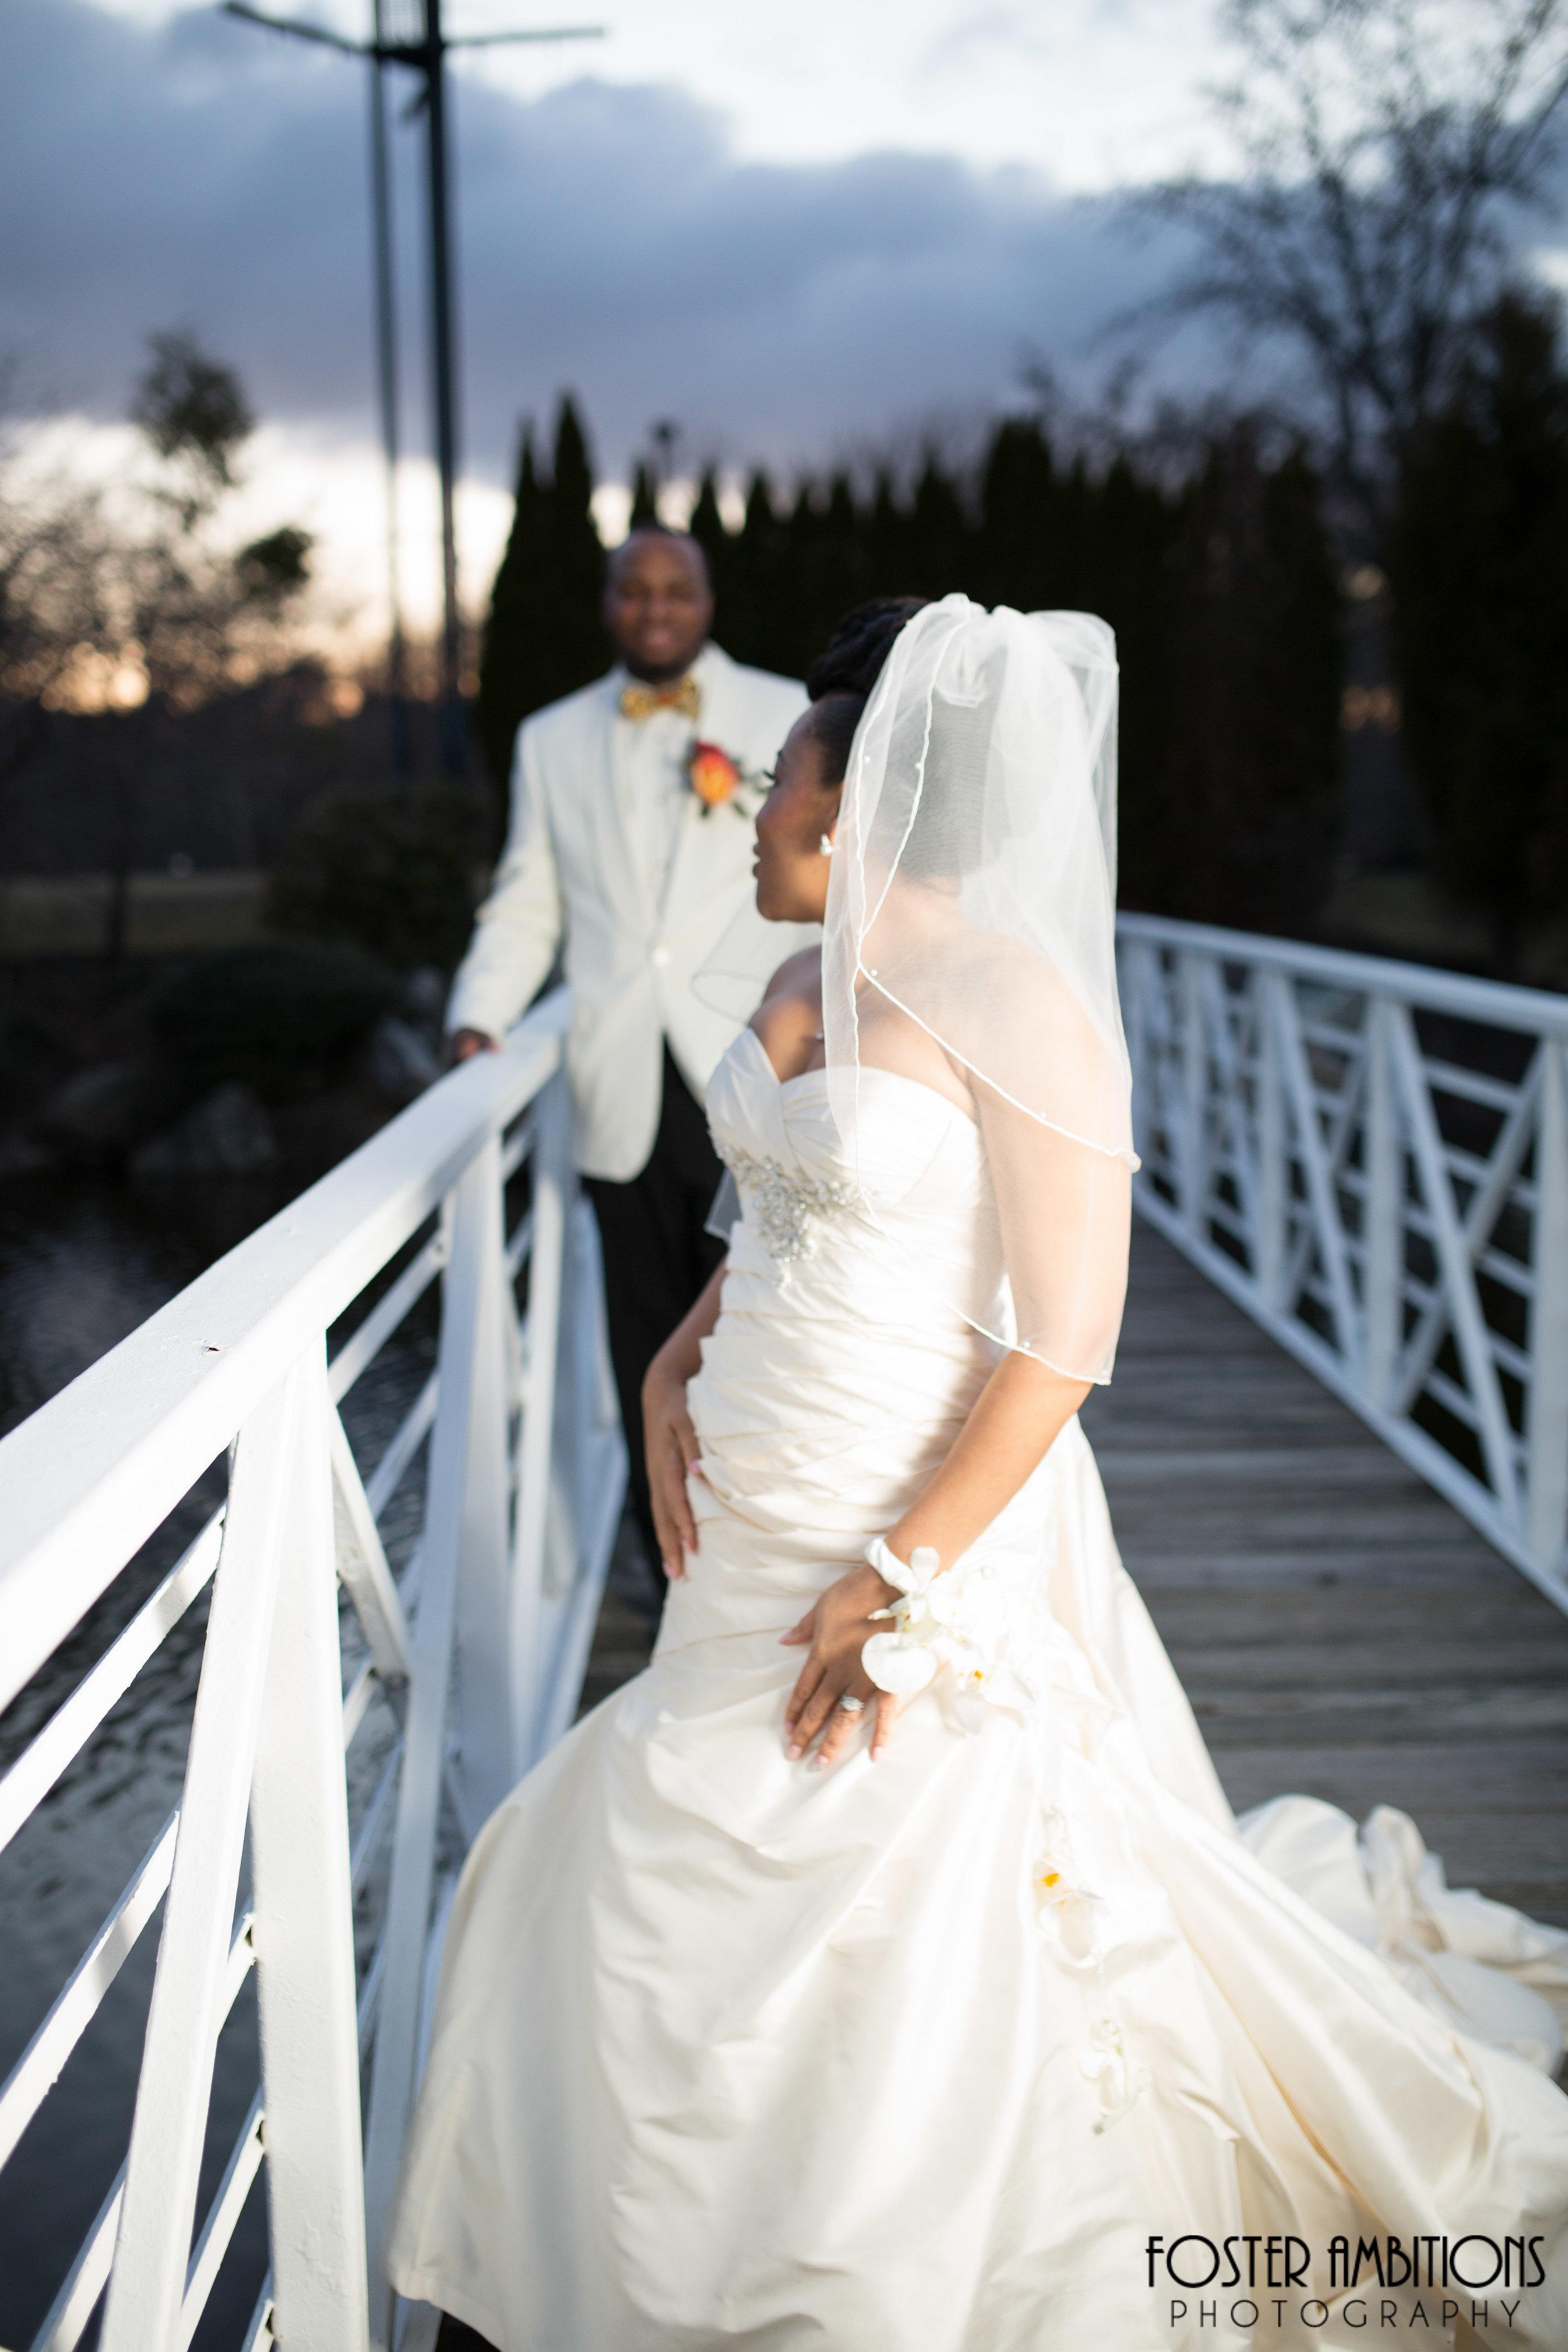 Charney-Rasheem-African-Chic-Wedding-9.JPG